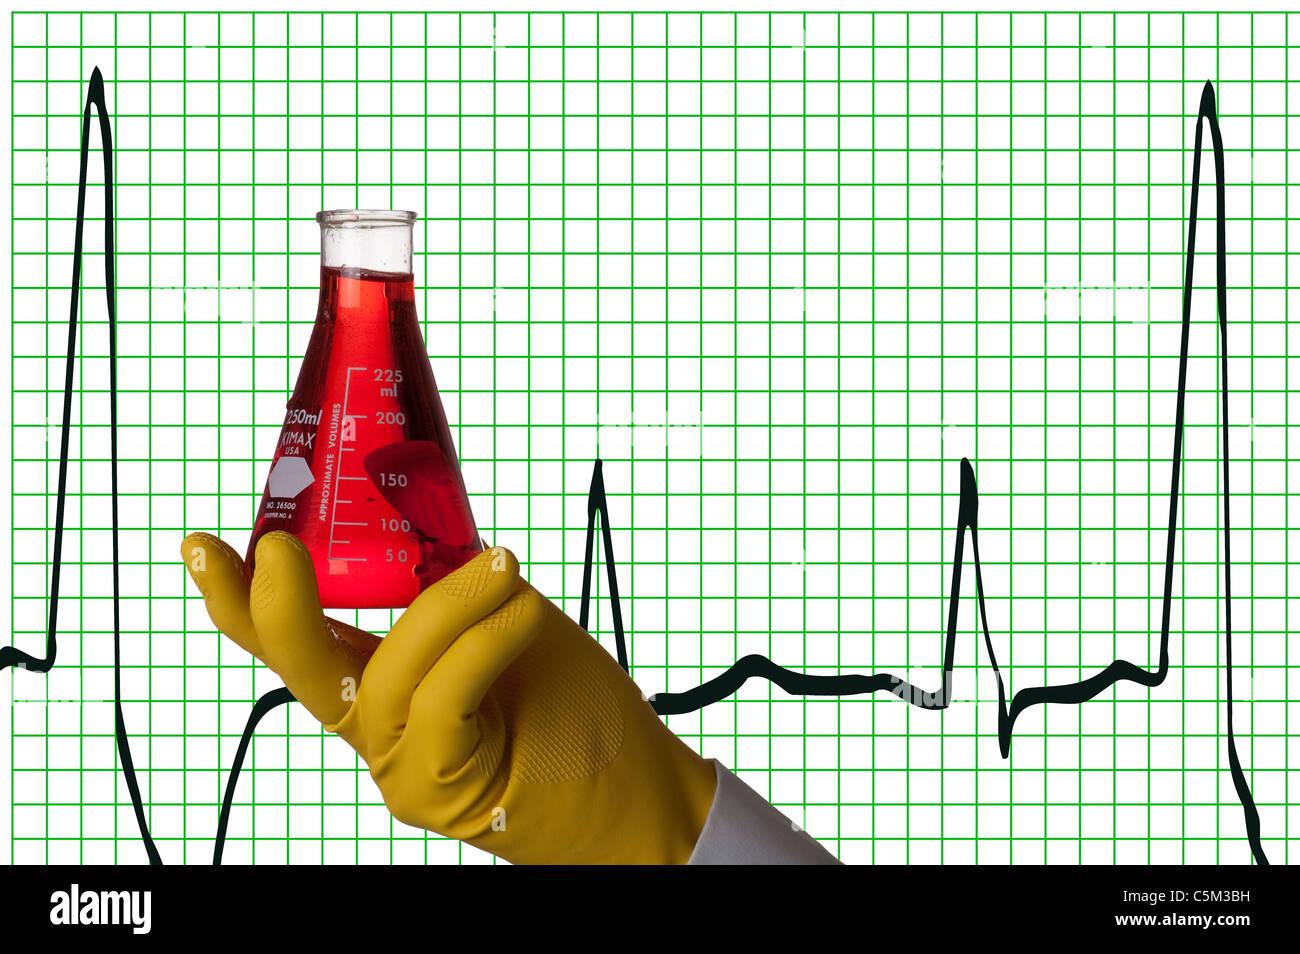 behandschuhten Hand hält Erlenmeyerkolben EKG-Hintergrund Stockbild